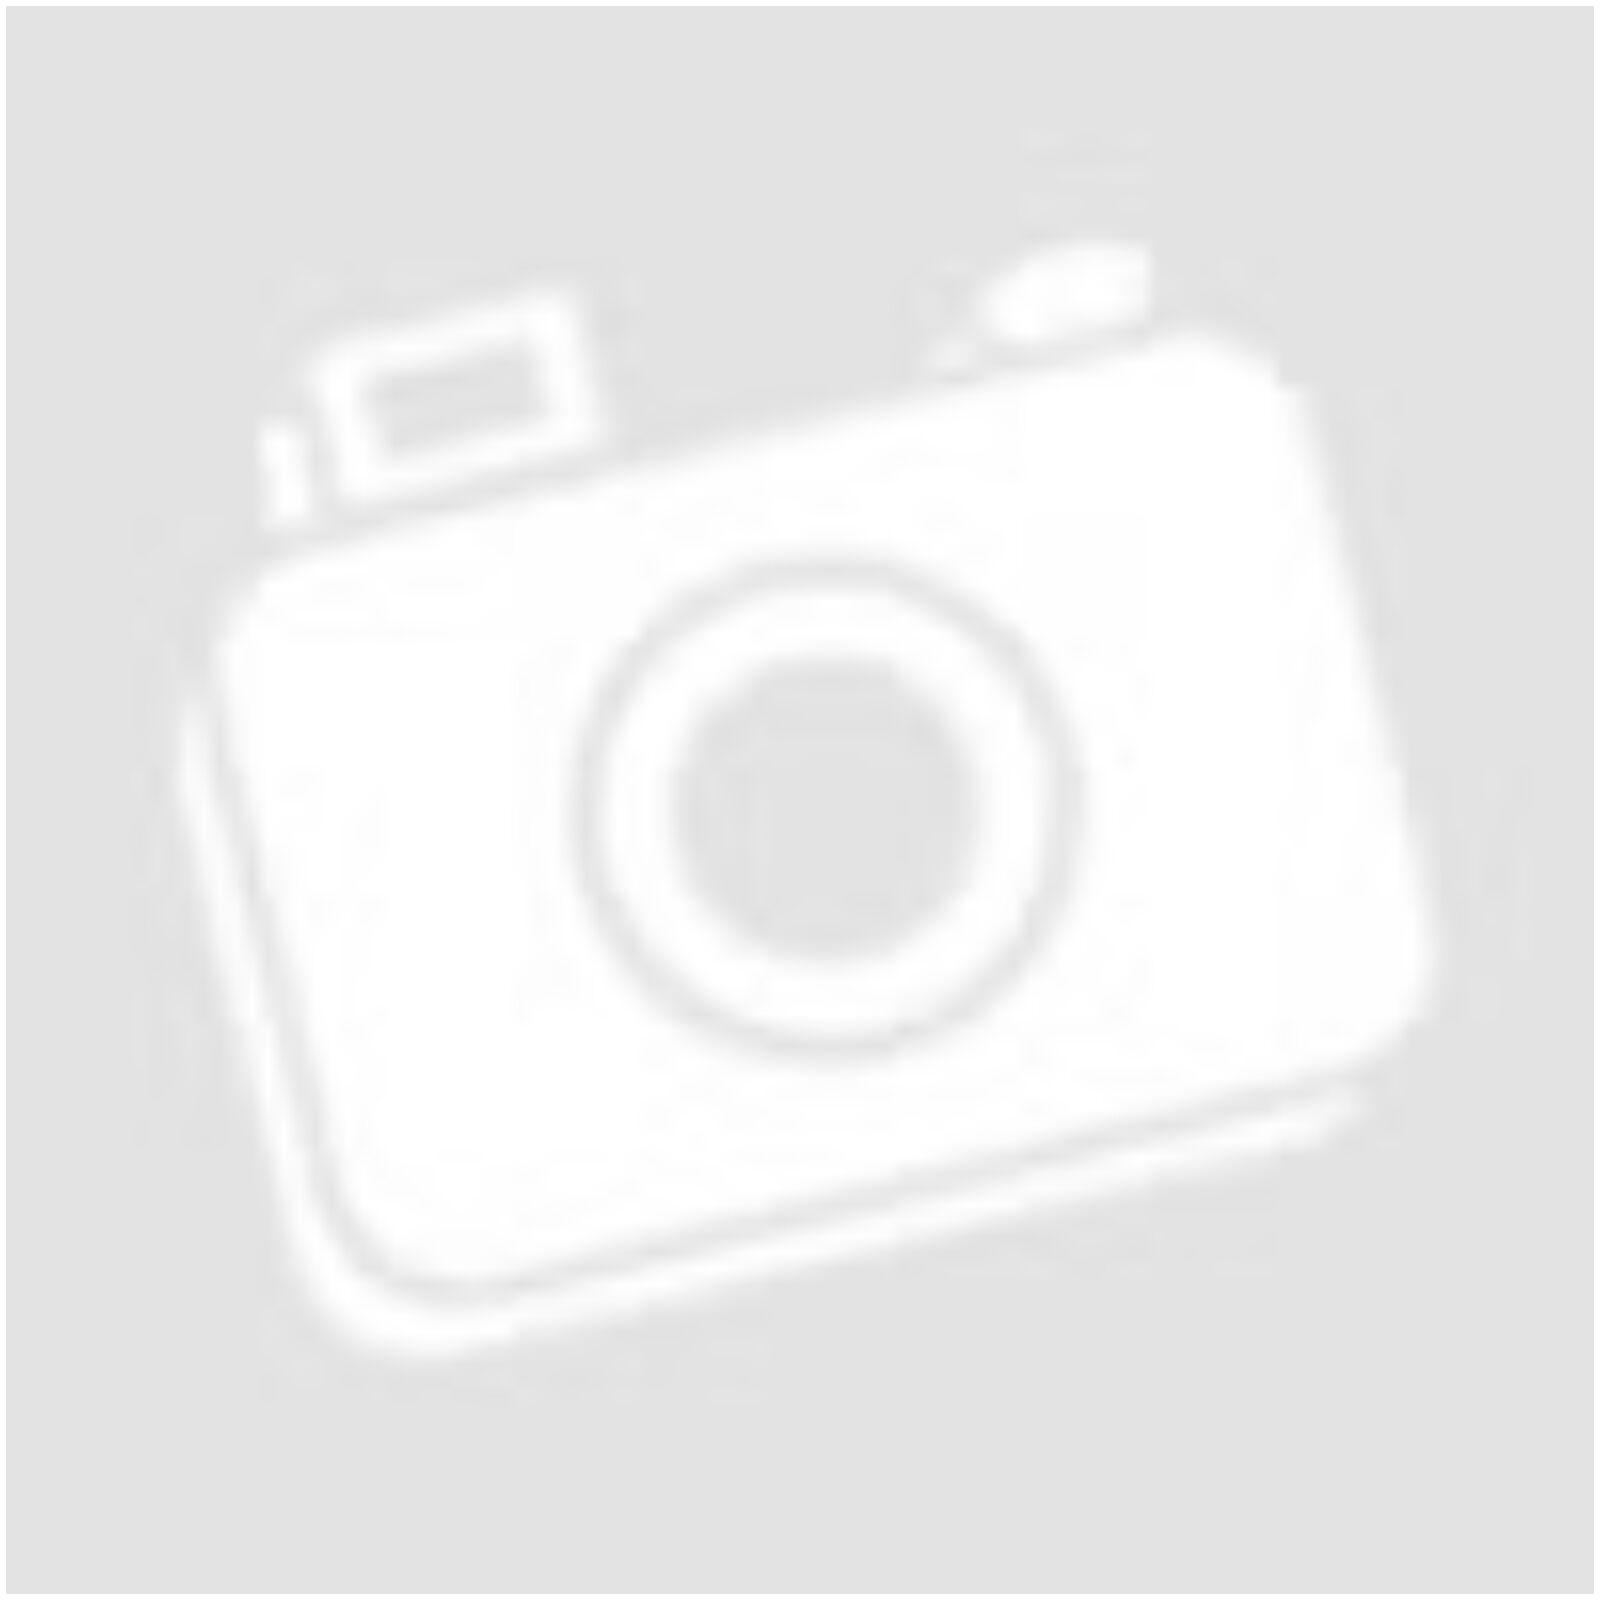 GCS 001 stencil